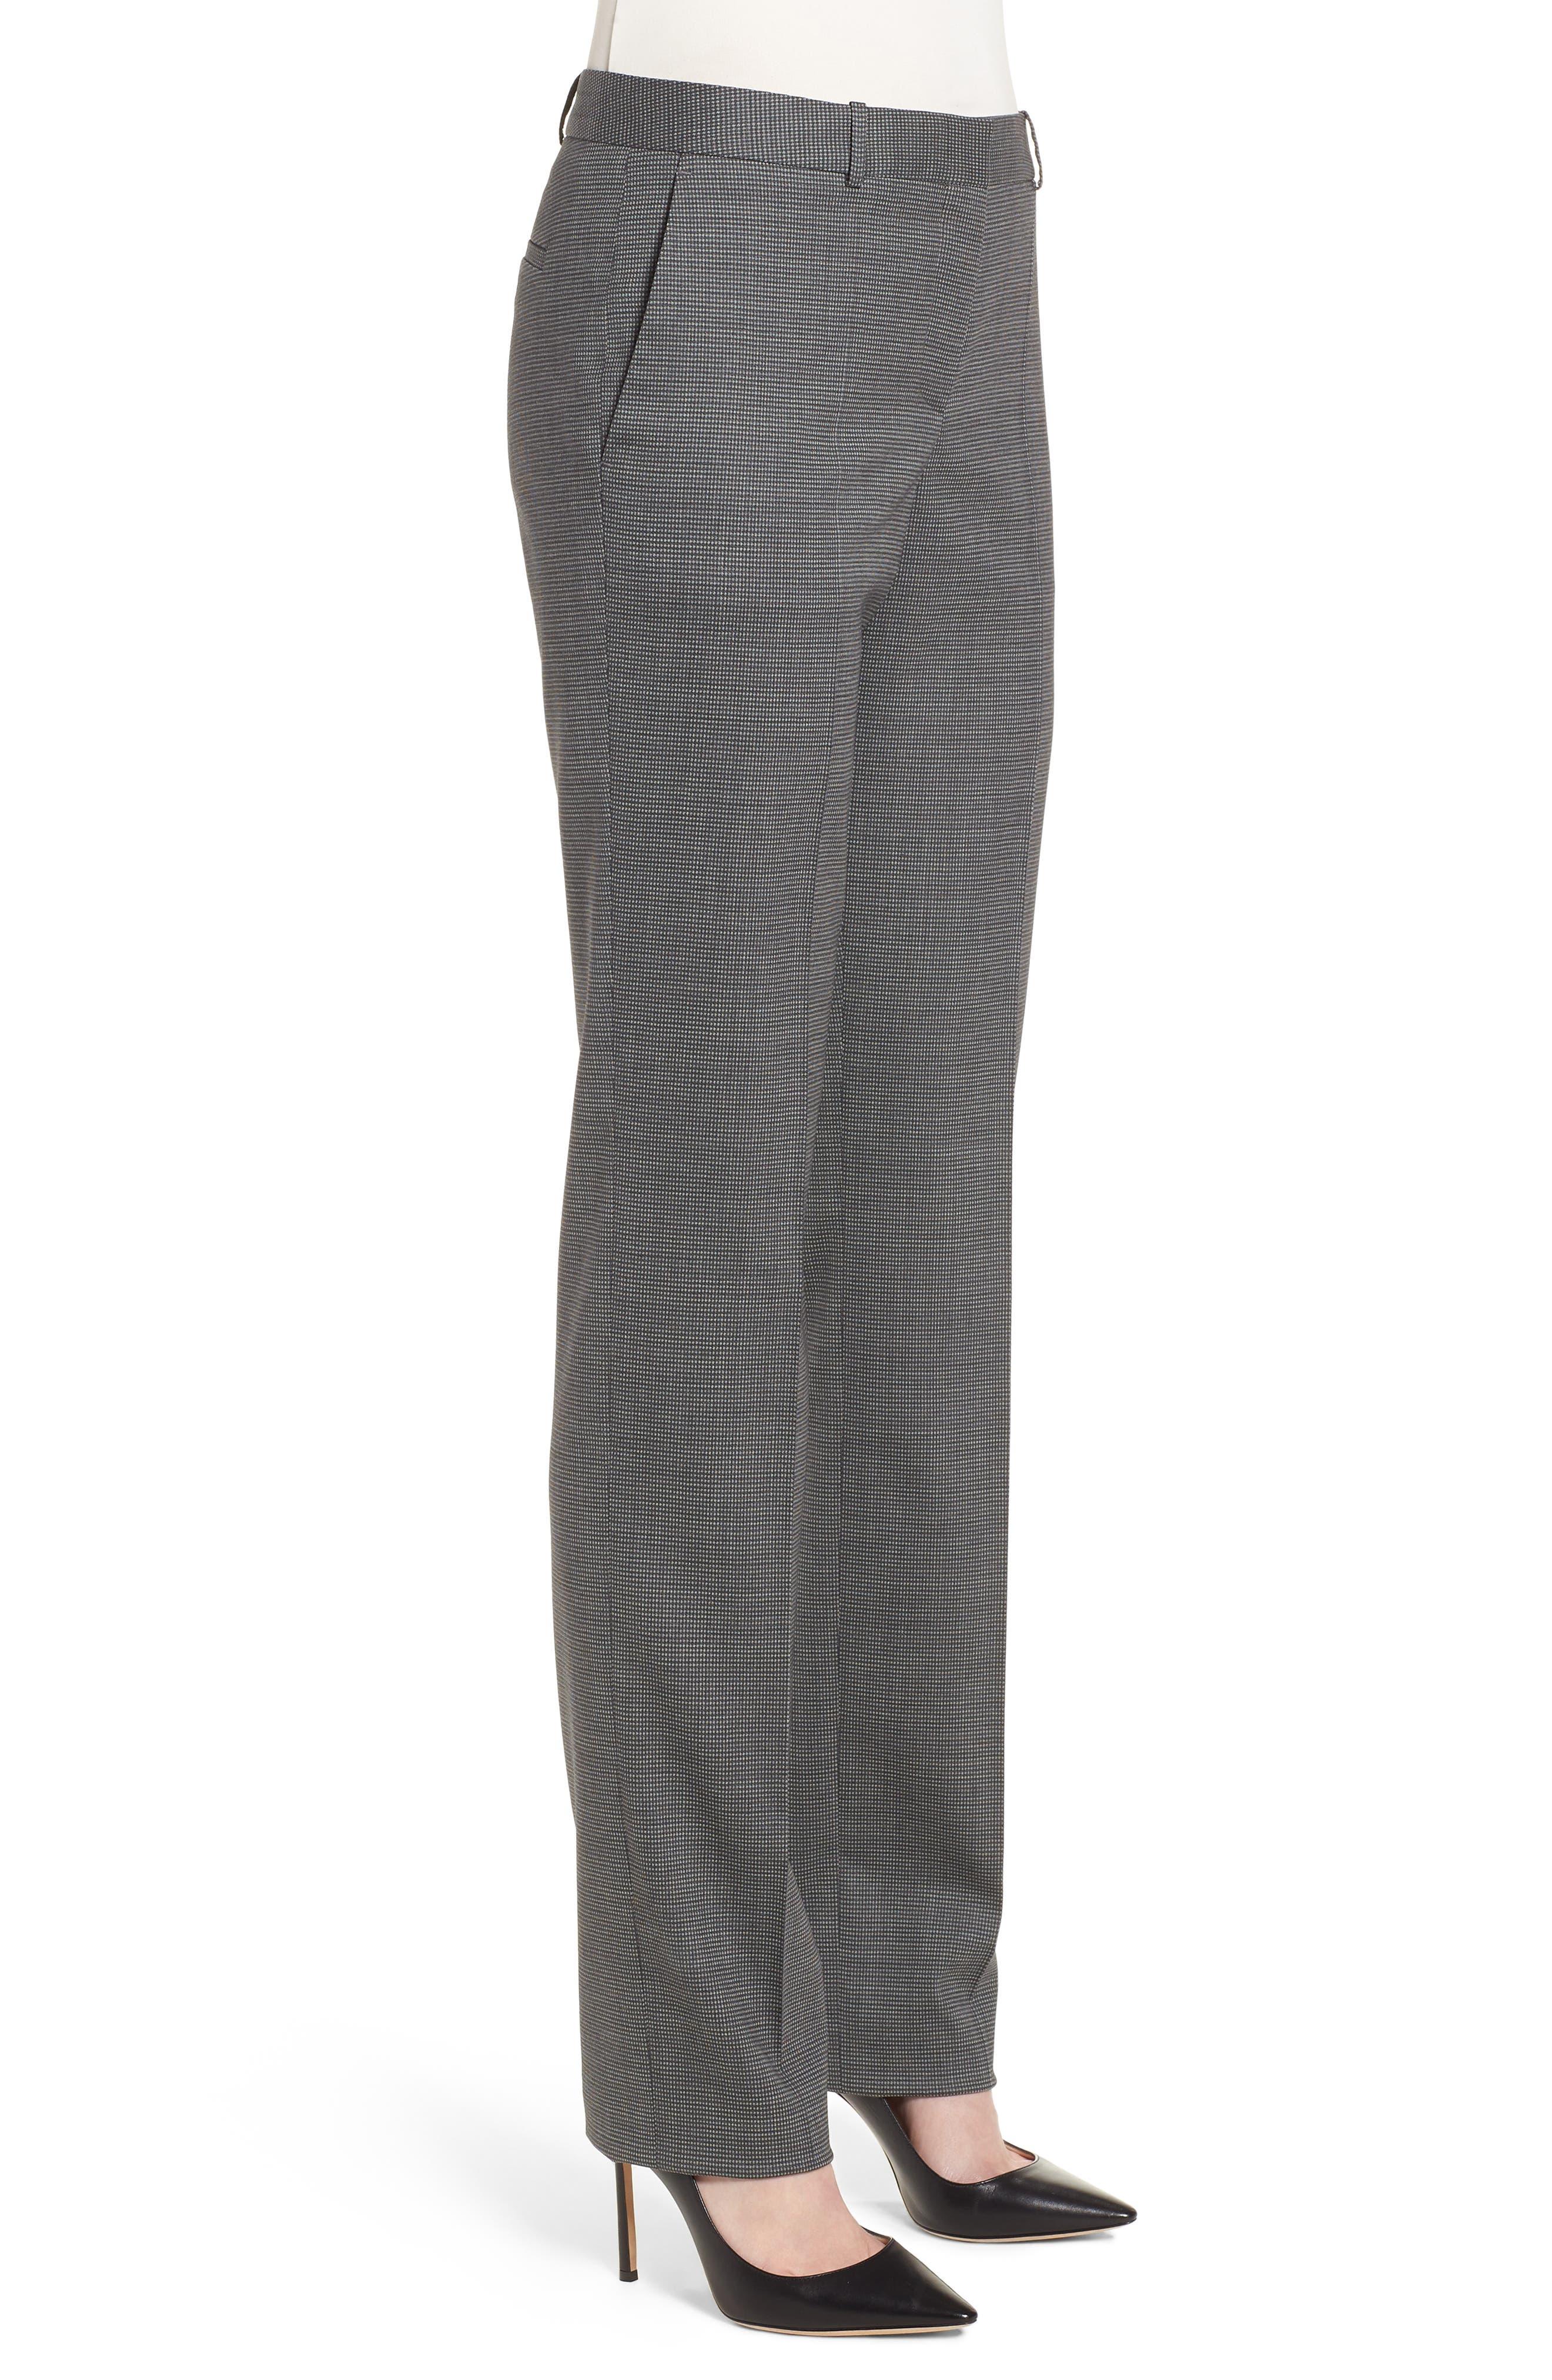 Tamea Minidessin Trousers,                             Alternate thumbnail 3, color,                             072